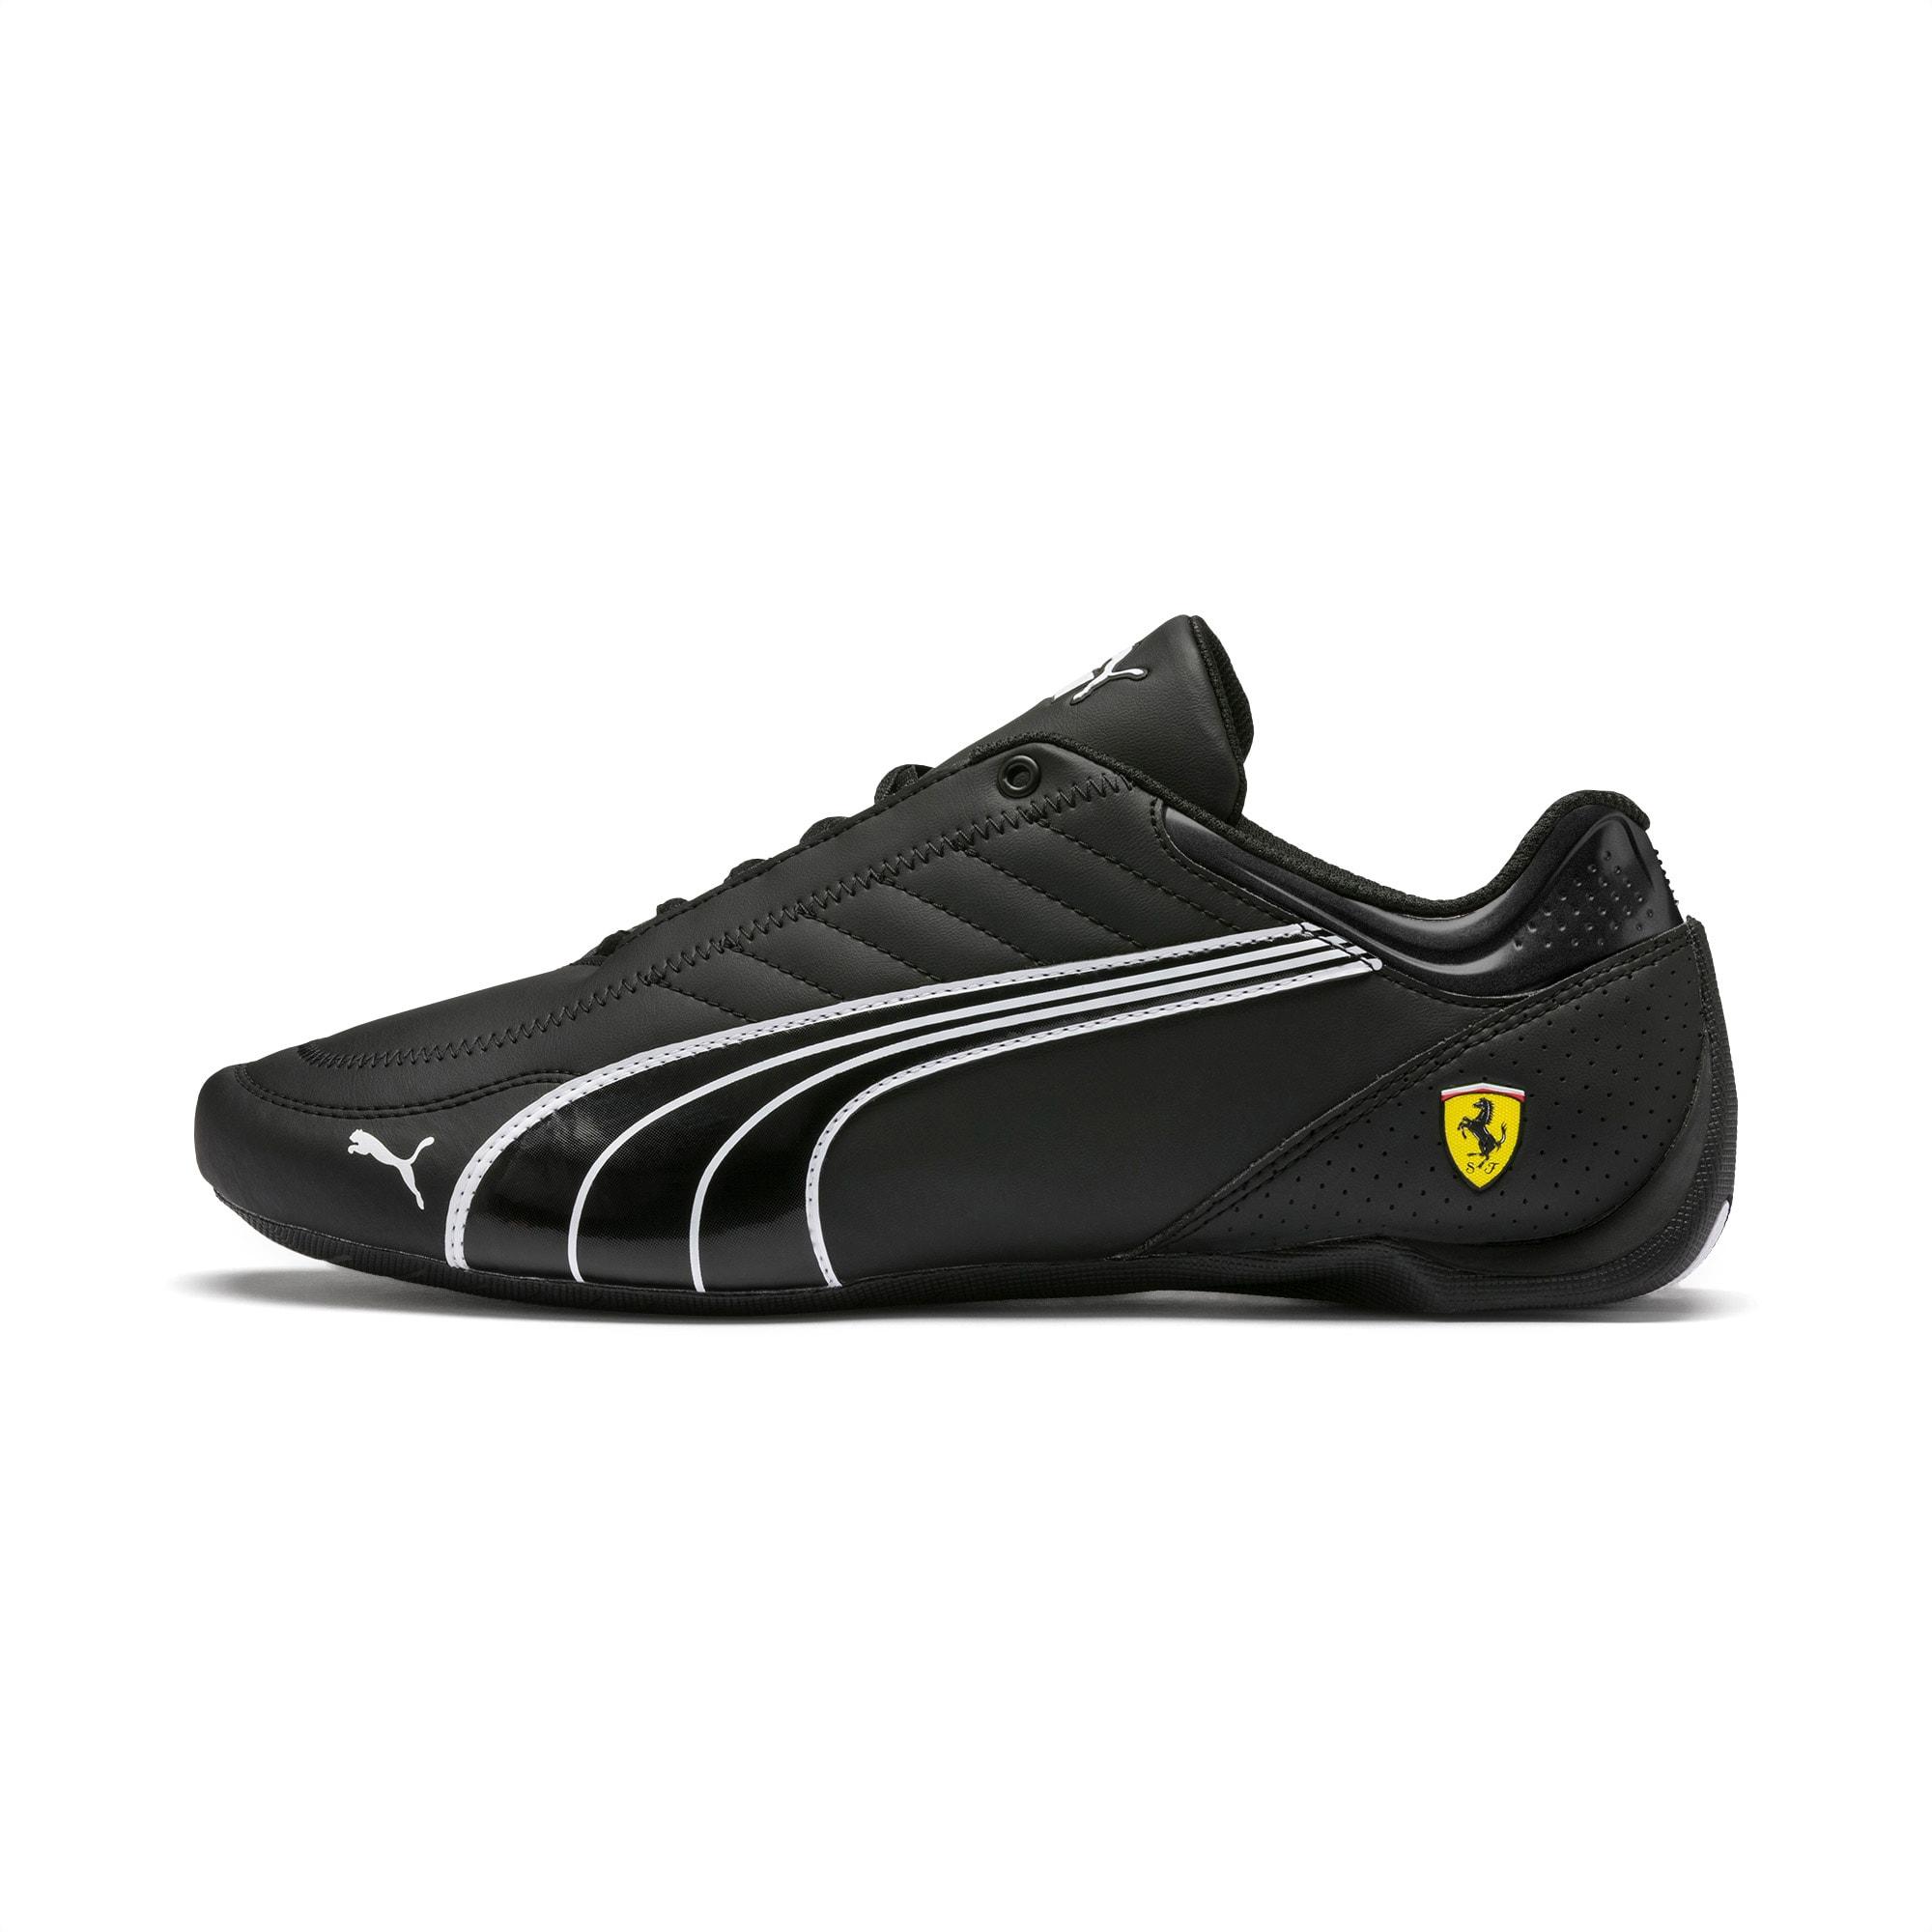 puma shoes free shipping, Unique Style Puma Ferrari